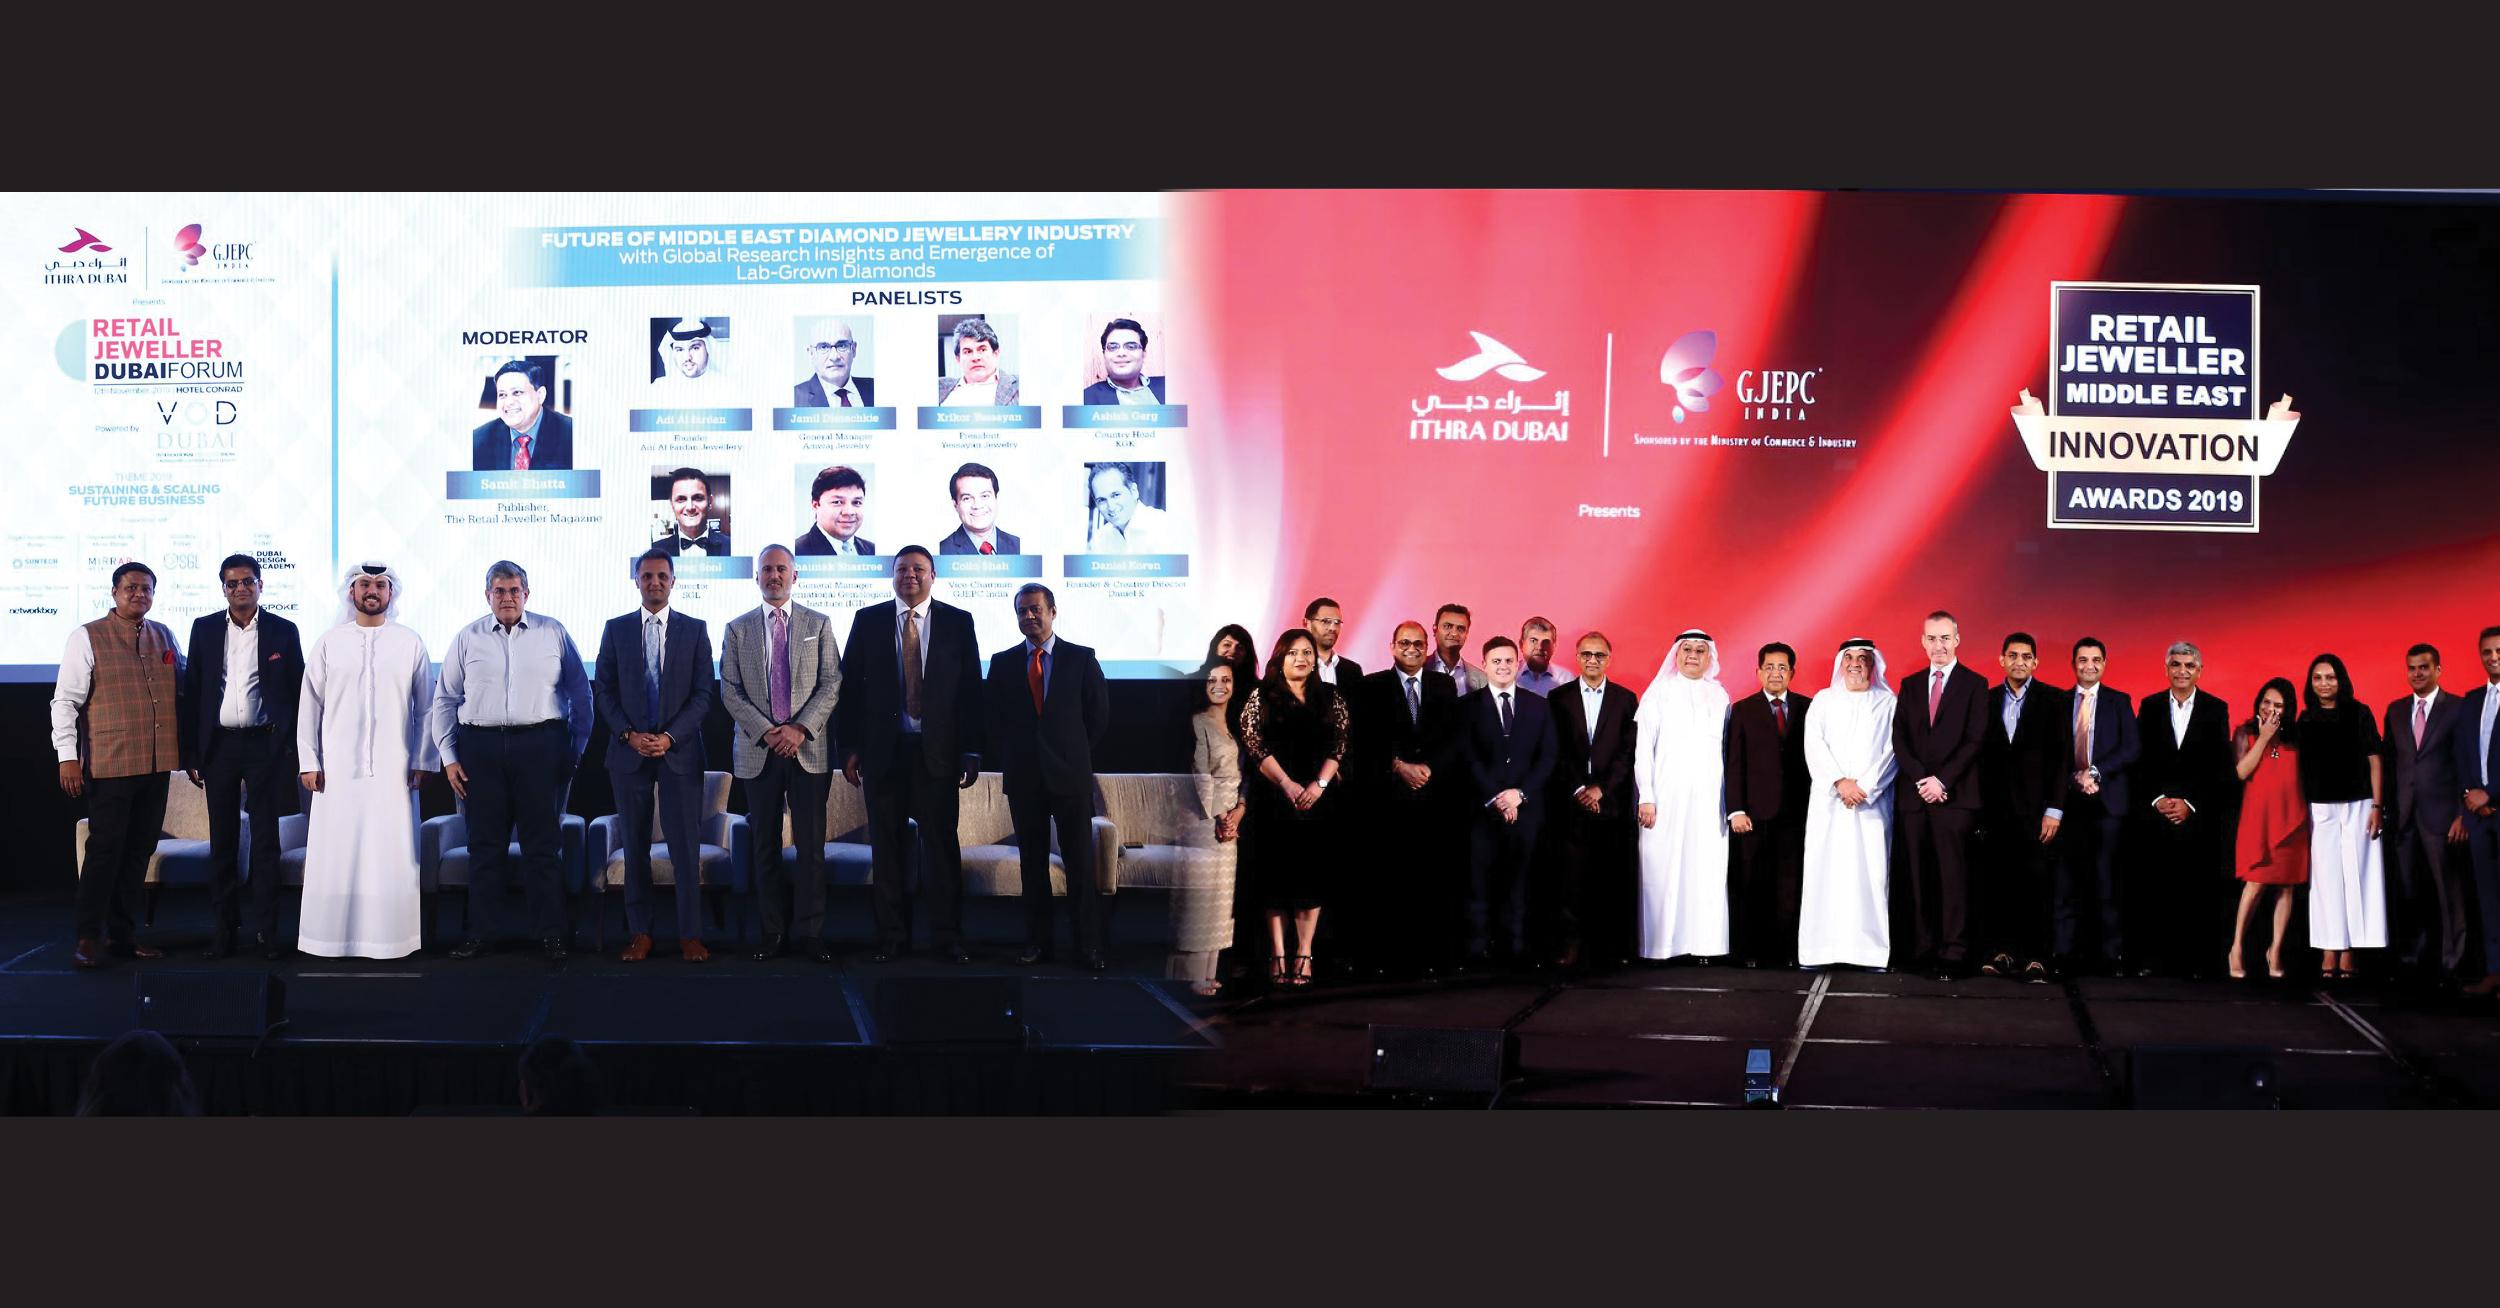 Retail Jeweller Dubai Forum and Awards 2019